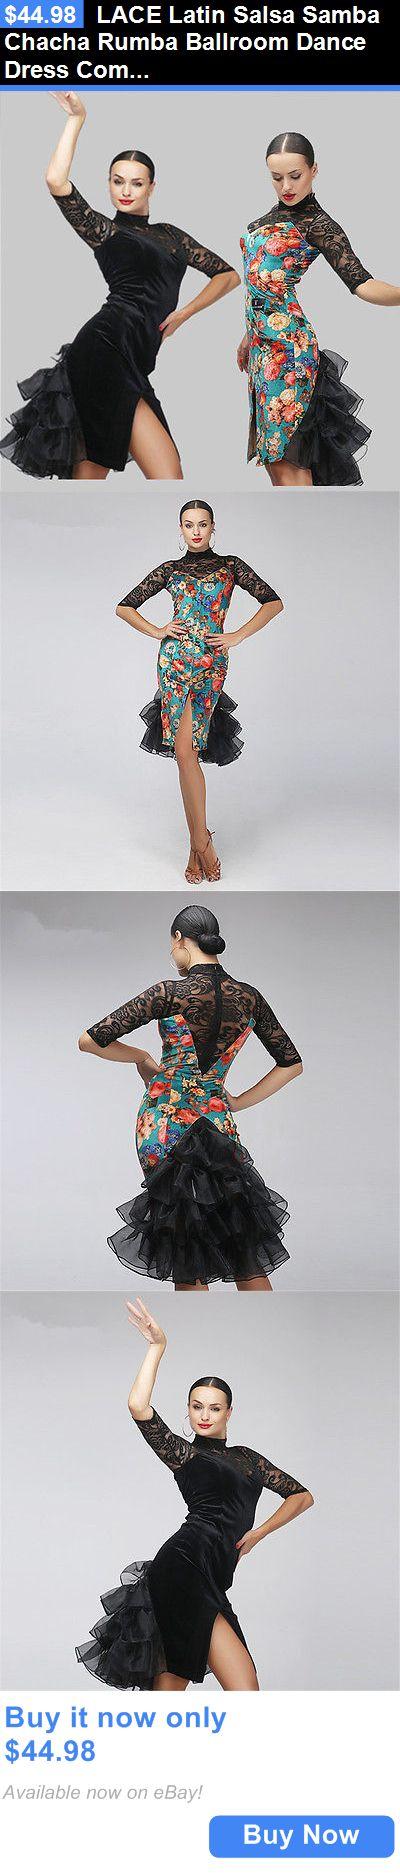 Cool Ballroom dresses Dancewear: Lace Latin Salsa Samba Chacha Rumba ...